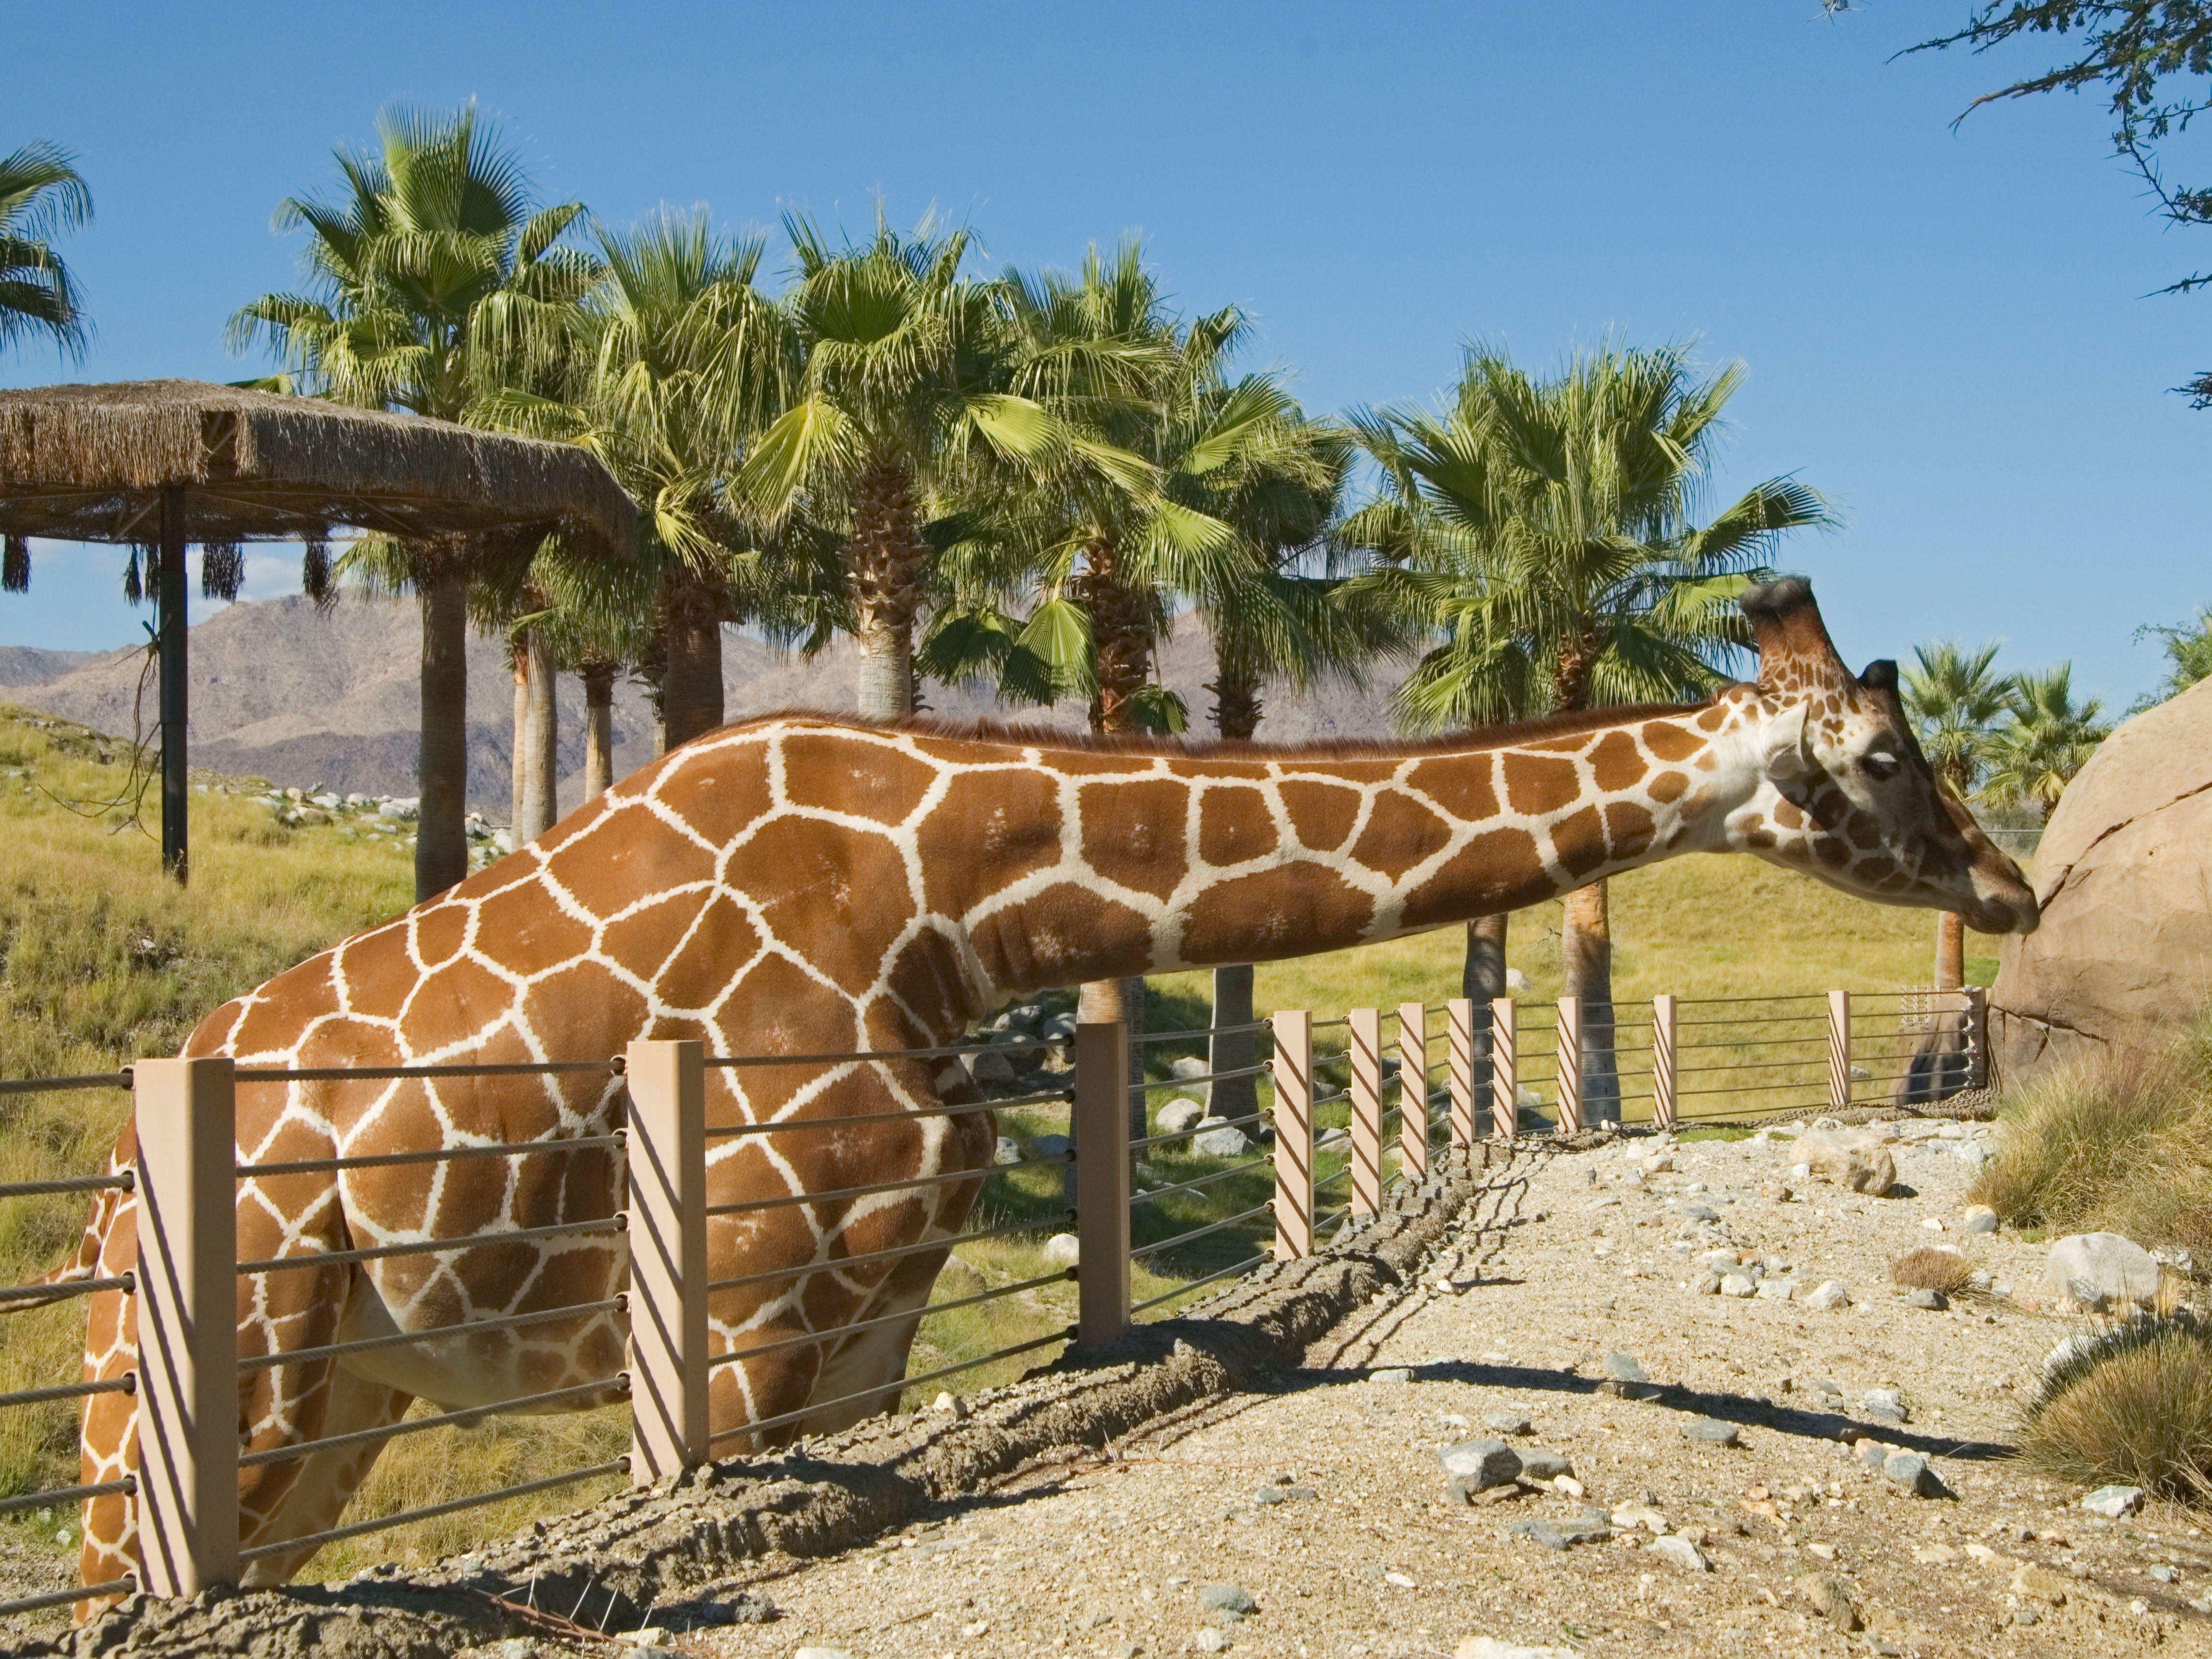 5ec20d50ed4c2bd947a85b29f47aba55 - The Living Desert Zoo & Botanical Gardens